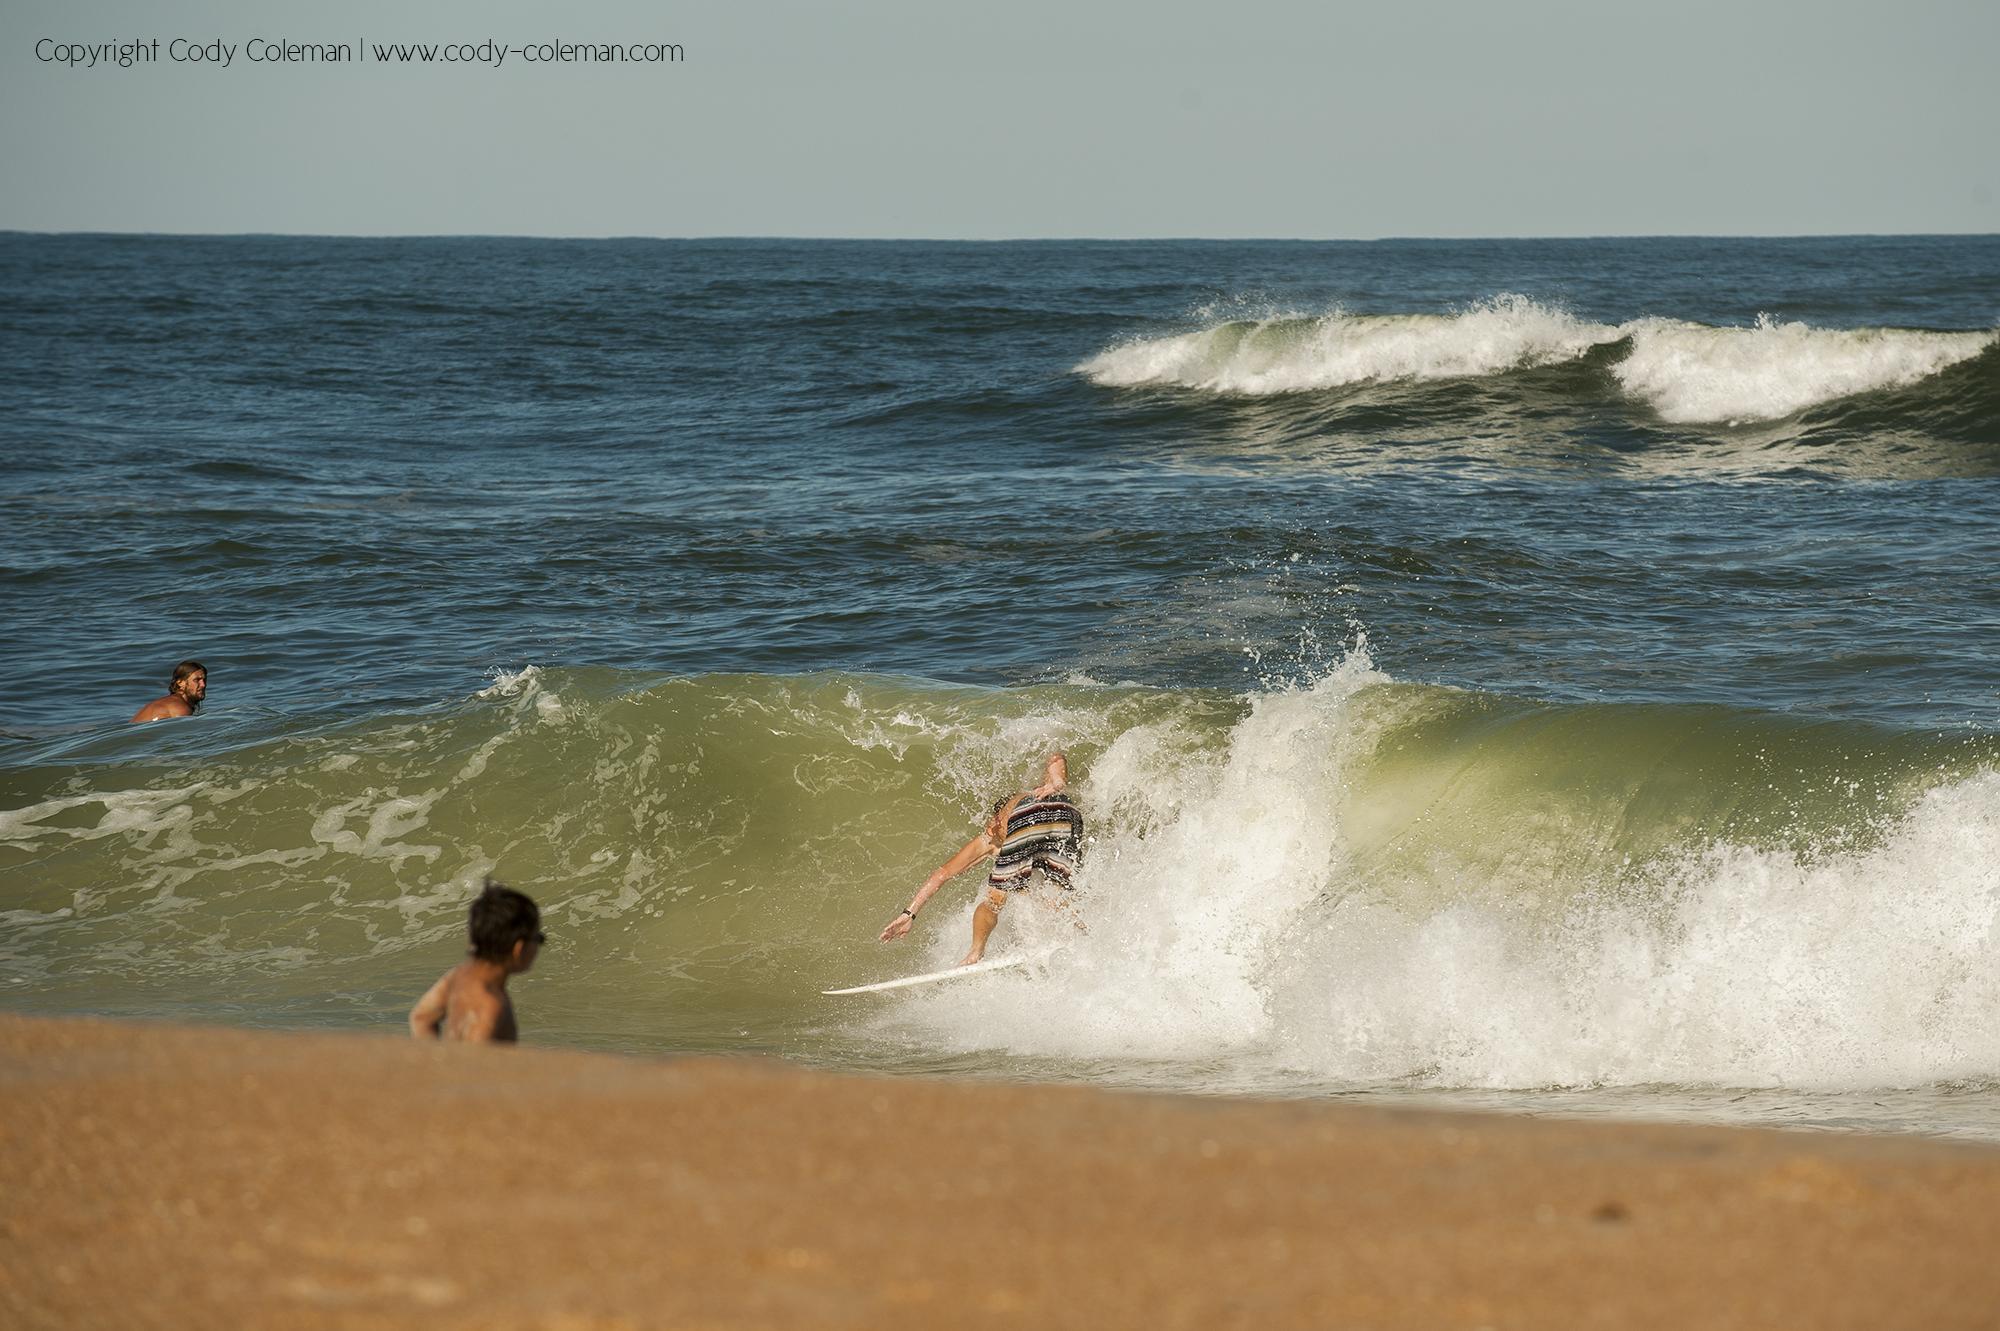 Andrew Gregorie pulling into Vilano beach shore pound .